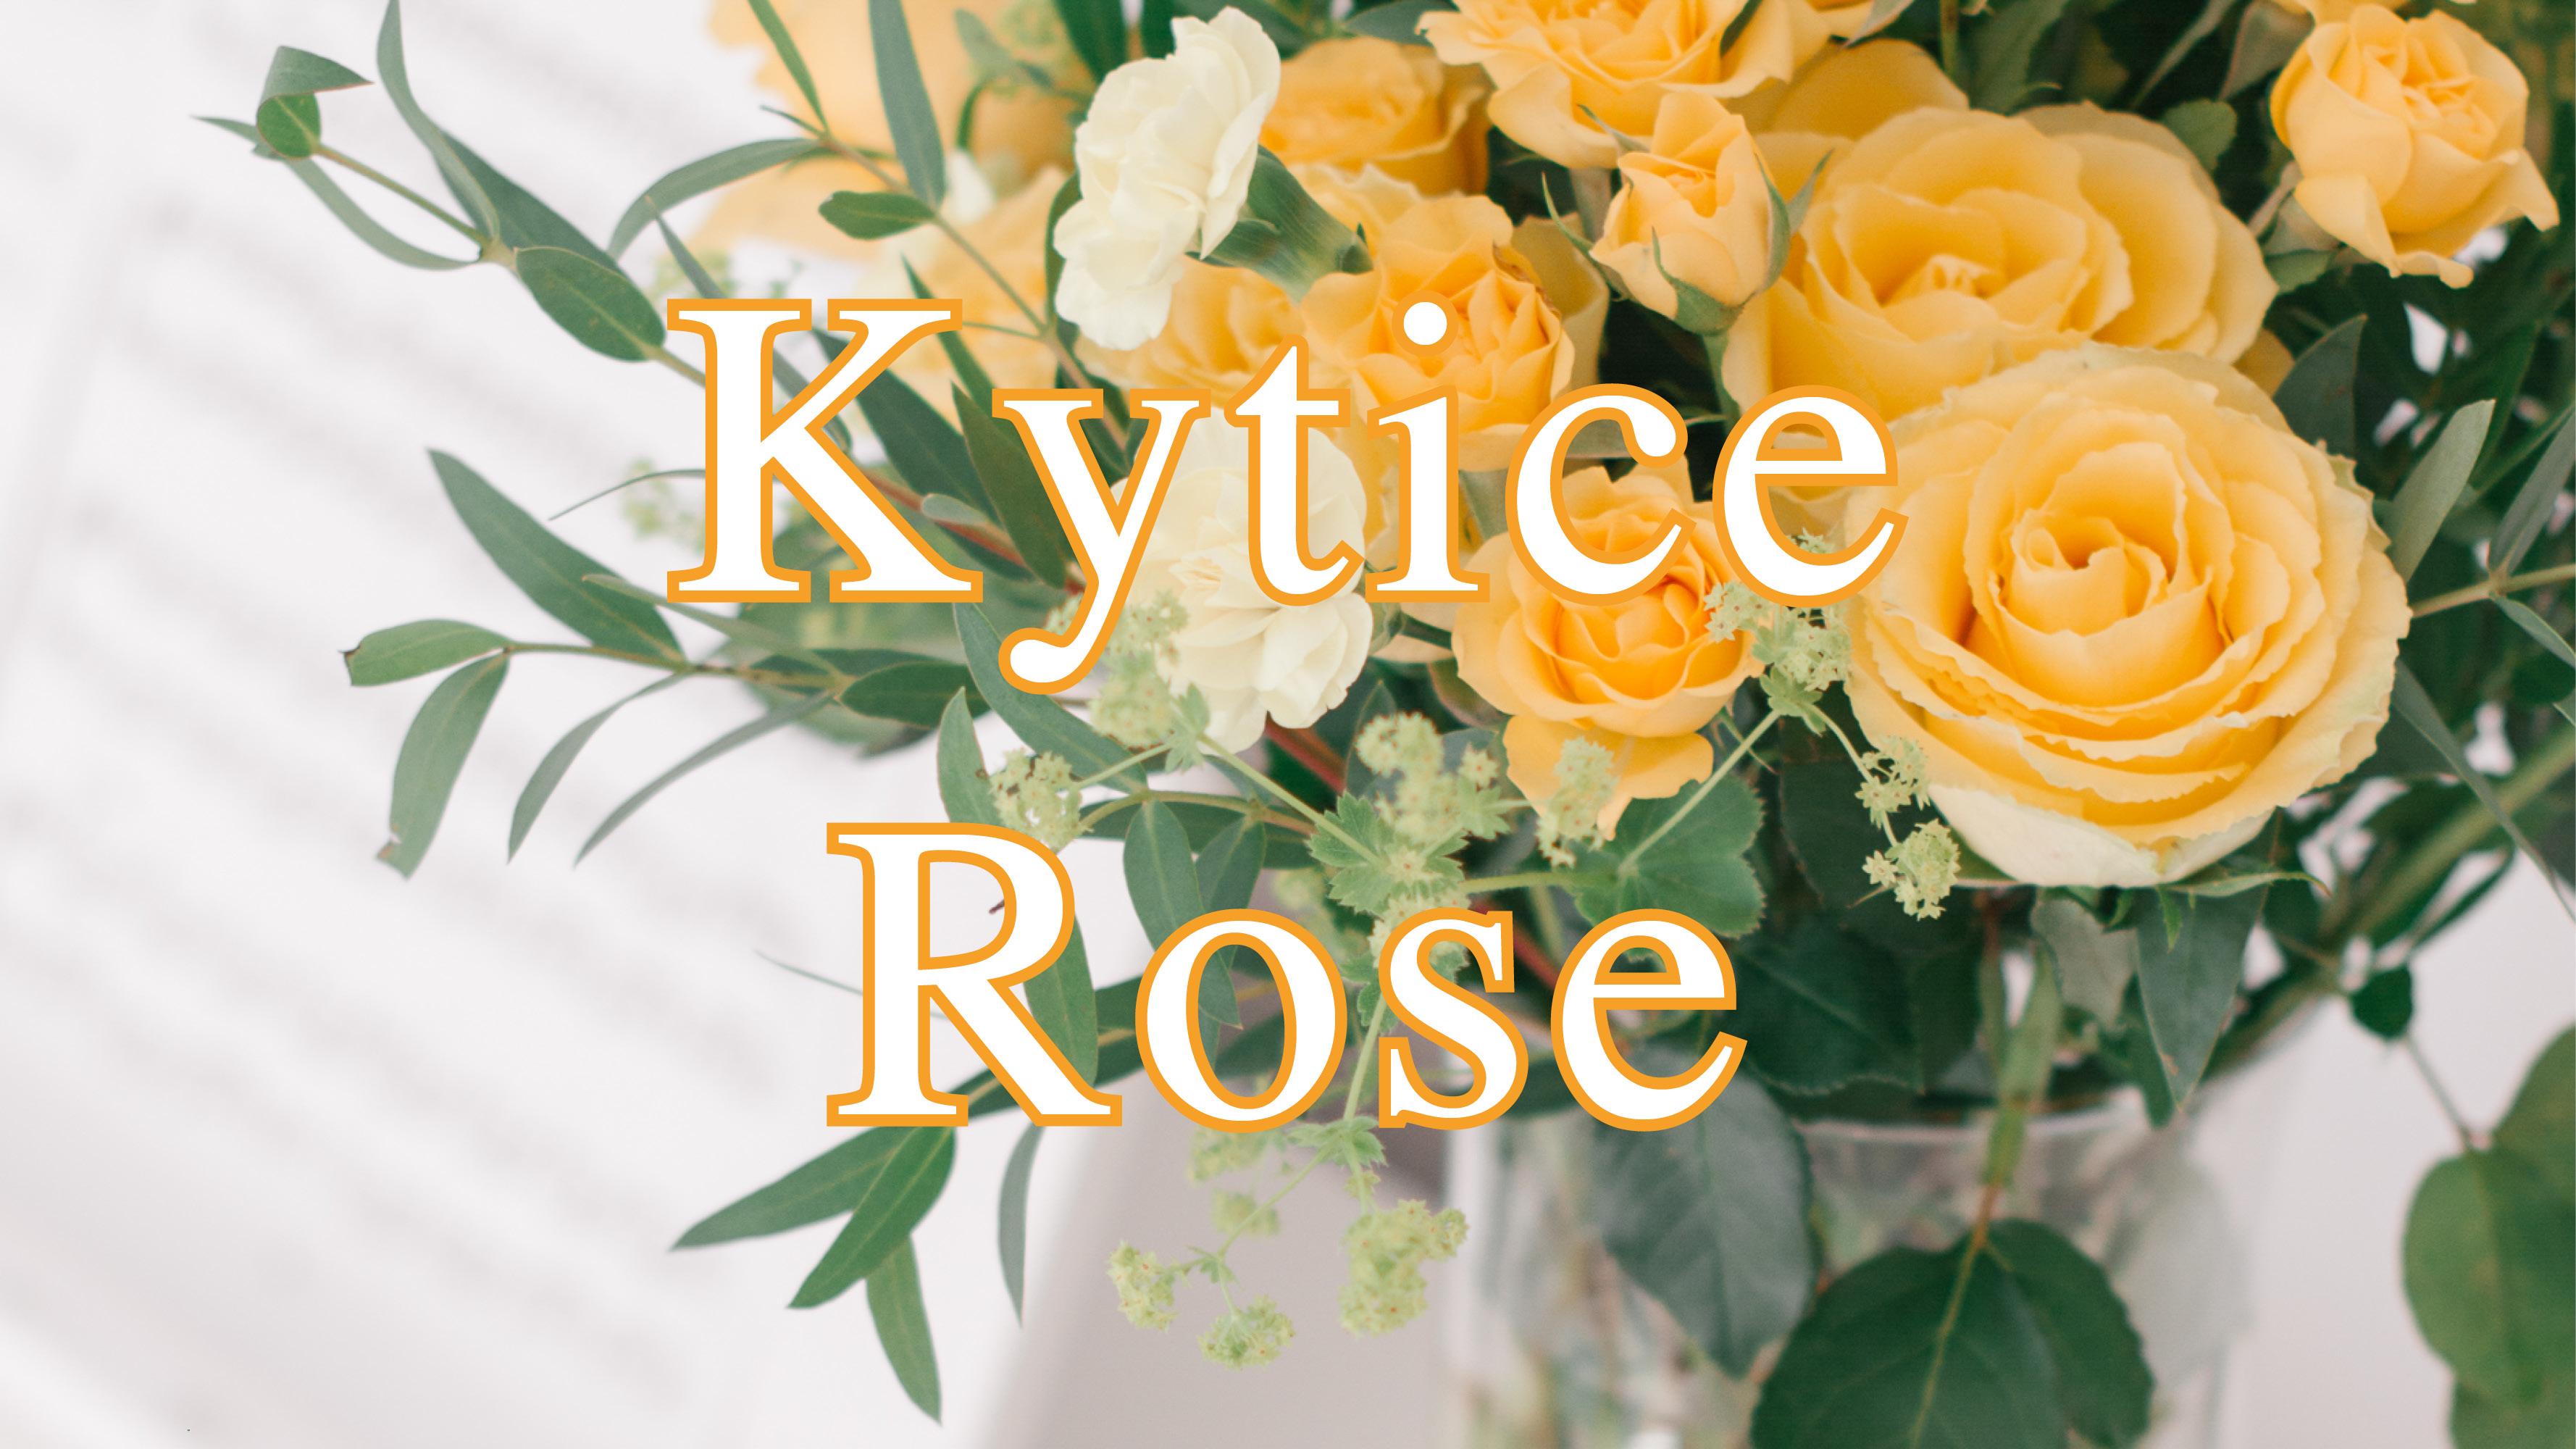 Kytice Rose